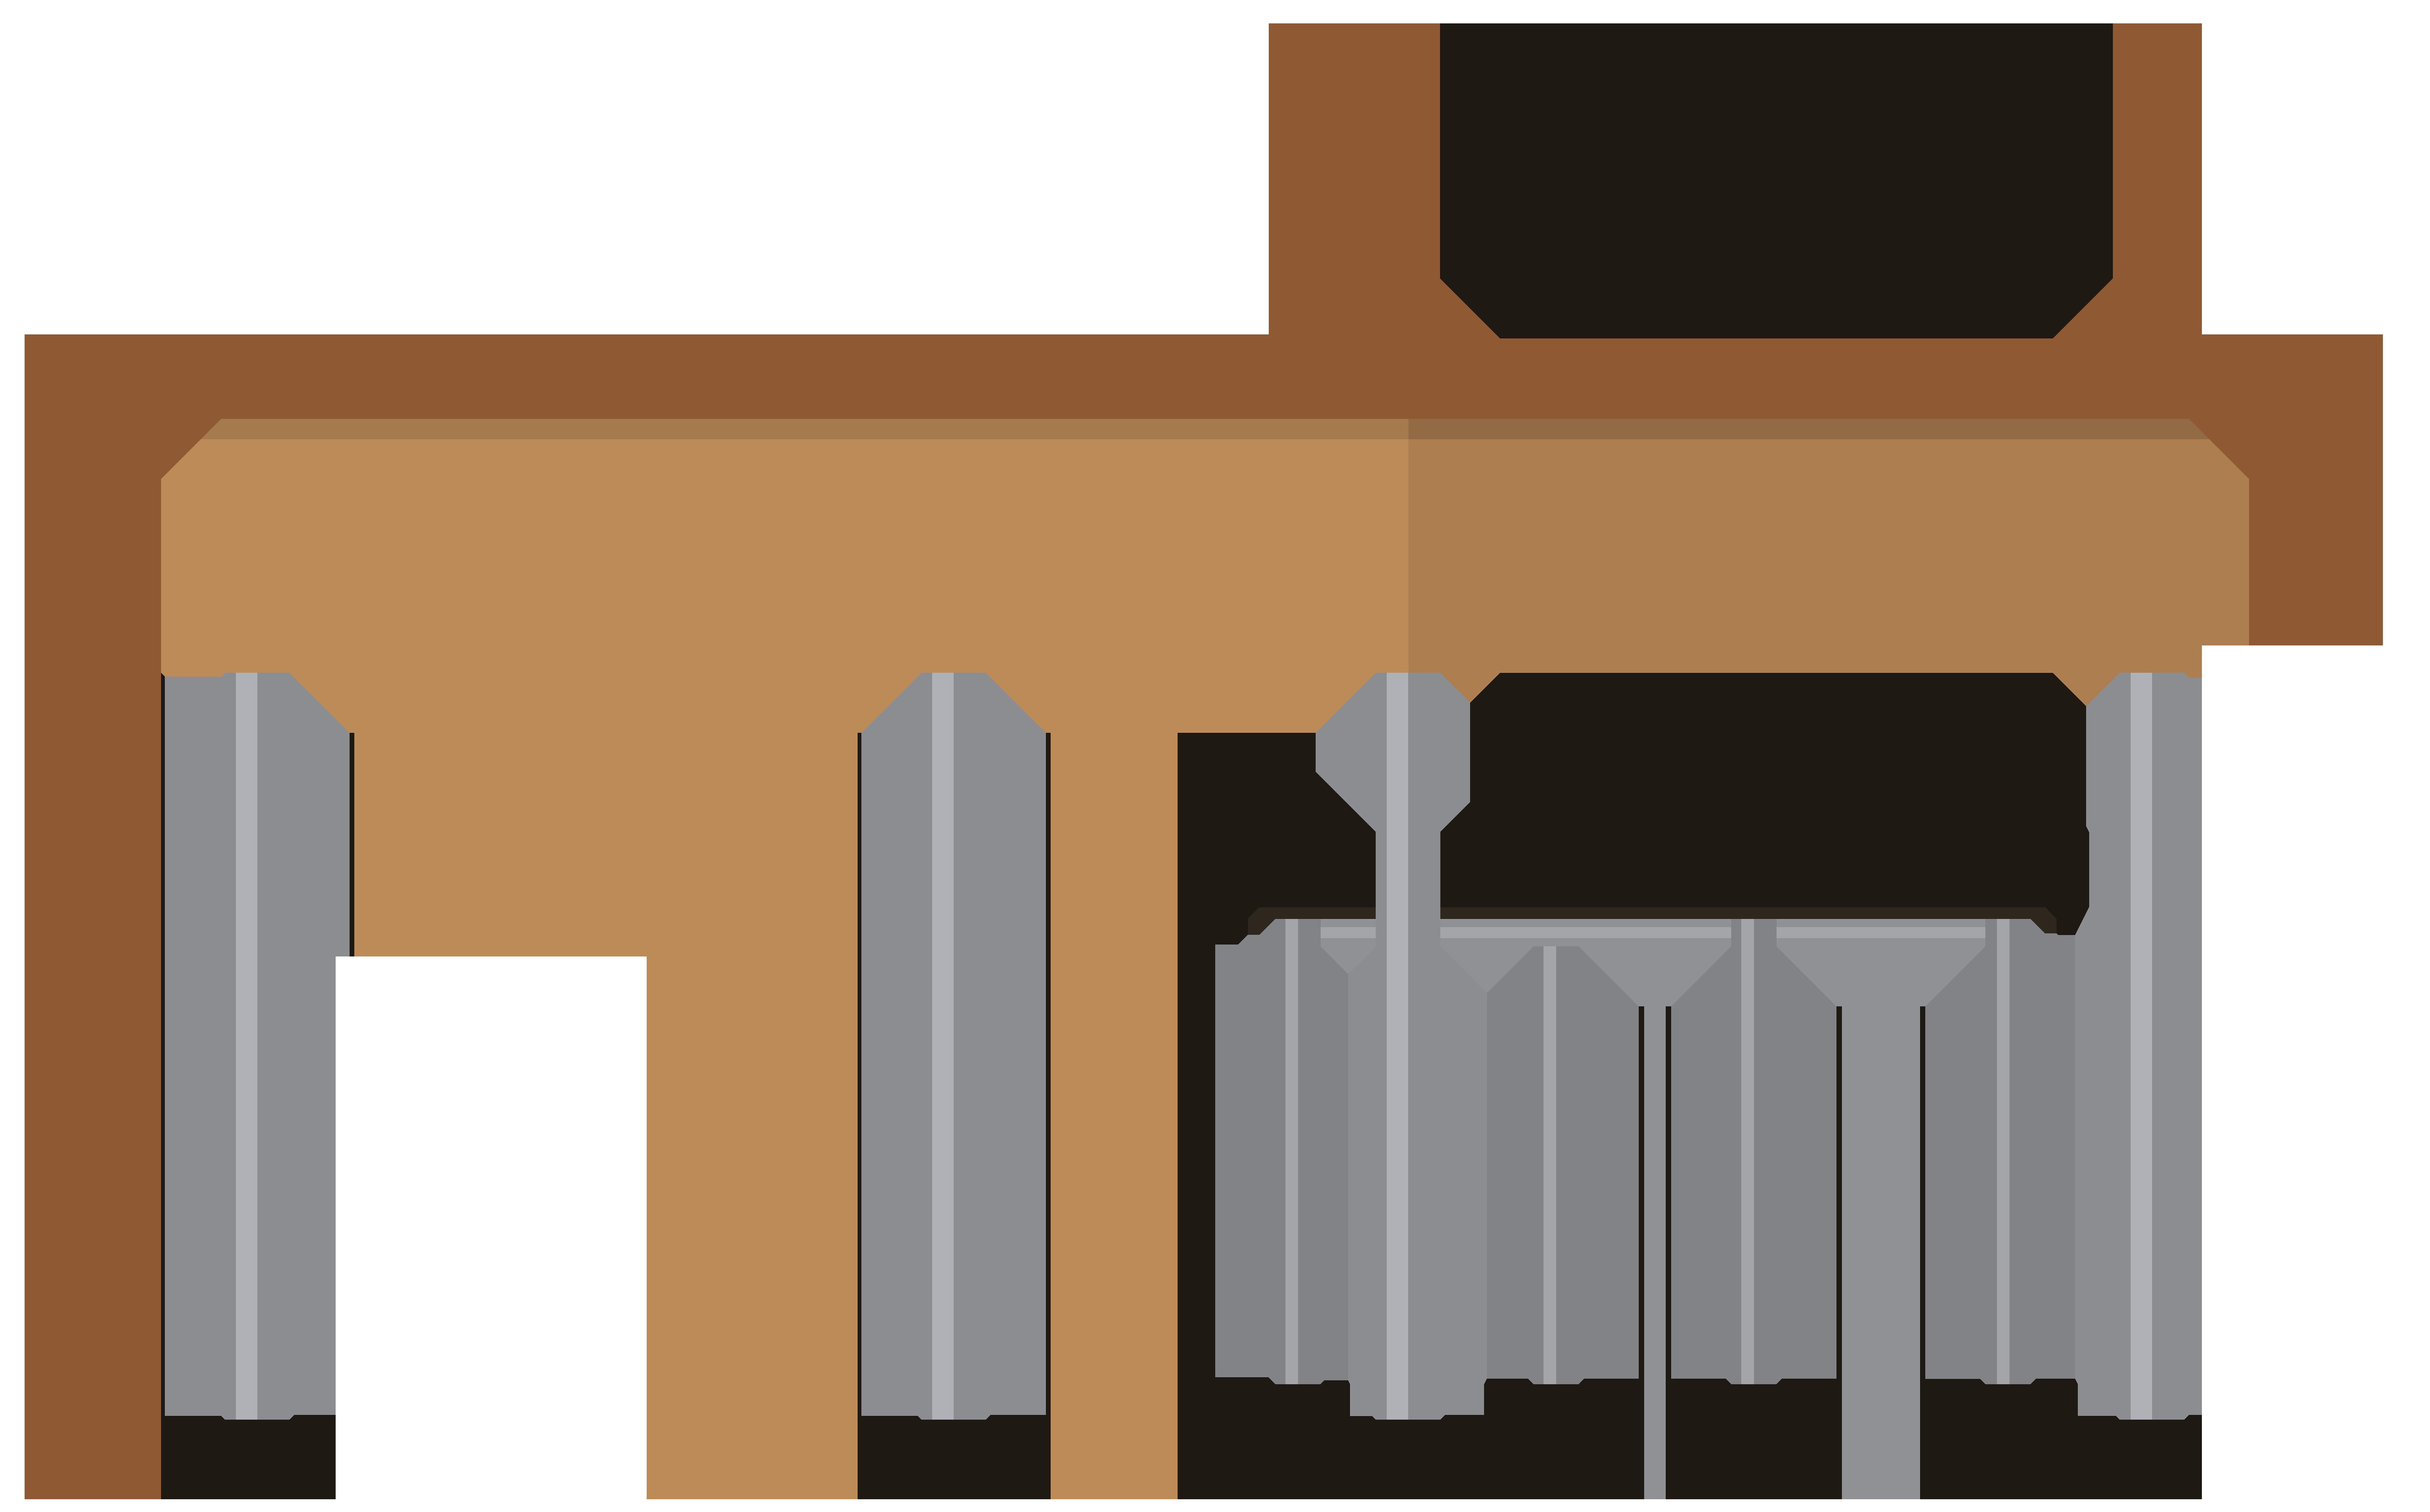 School Desks Clip Art PNG Image.